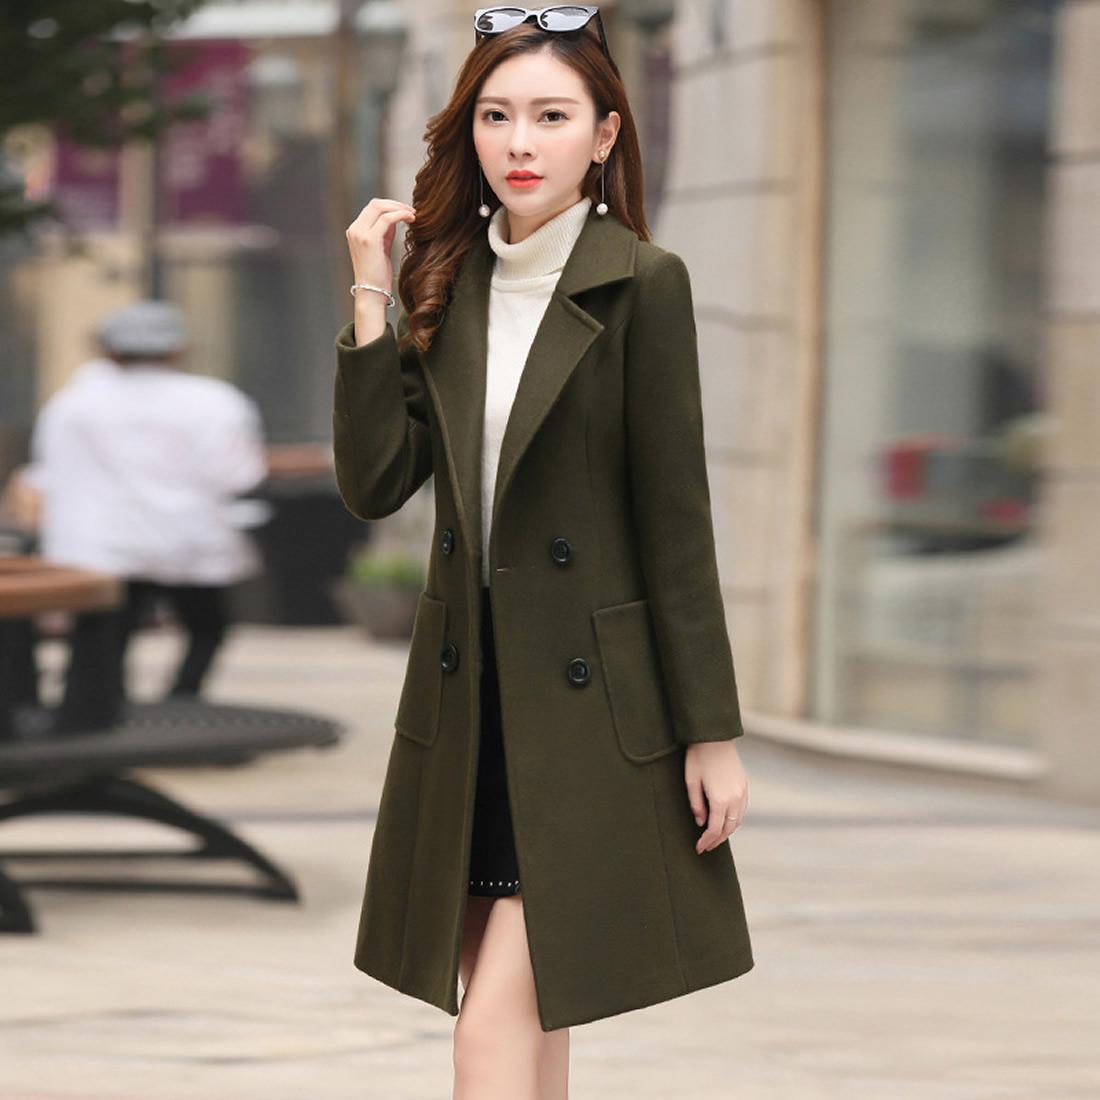 68ea29e78 Compre Outono Inverno Mulher Casacos De Lã 2018 Moda Casaco Feminino  Mulheres Jaqueta Cáqui Exército   Verde Plus Size Outwear 3xl 4xl Sobretudo  De ...